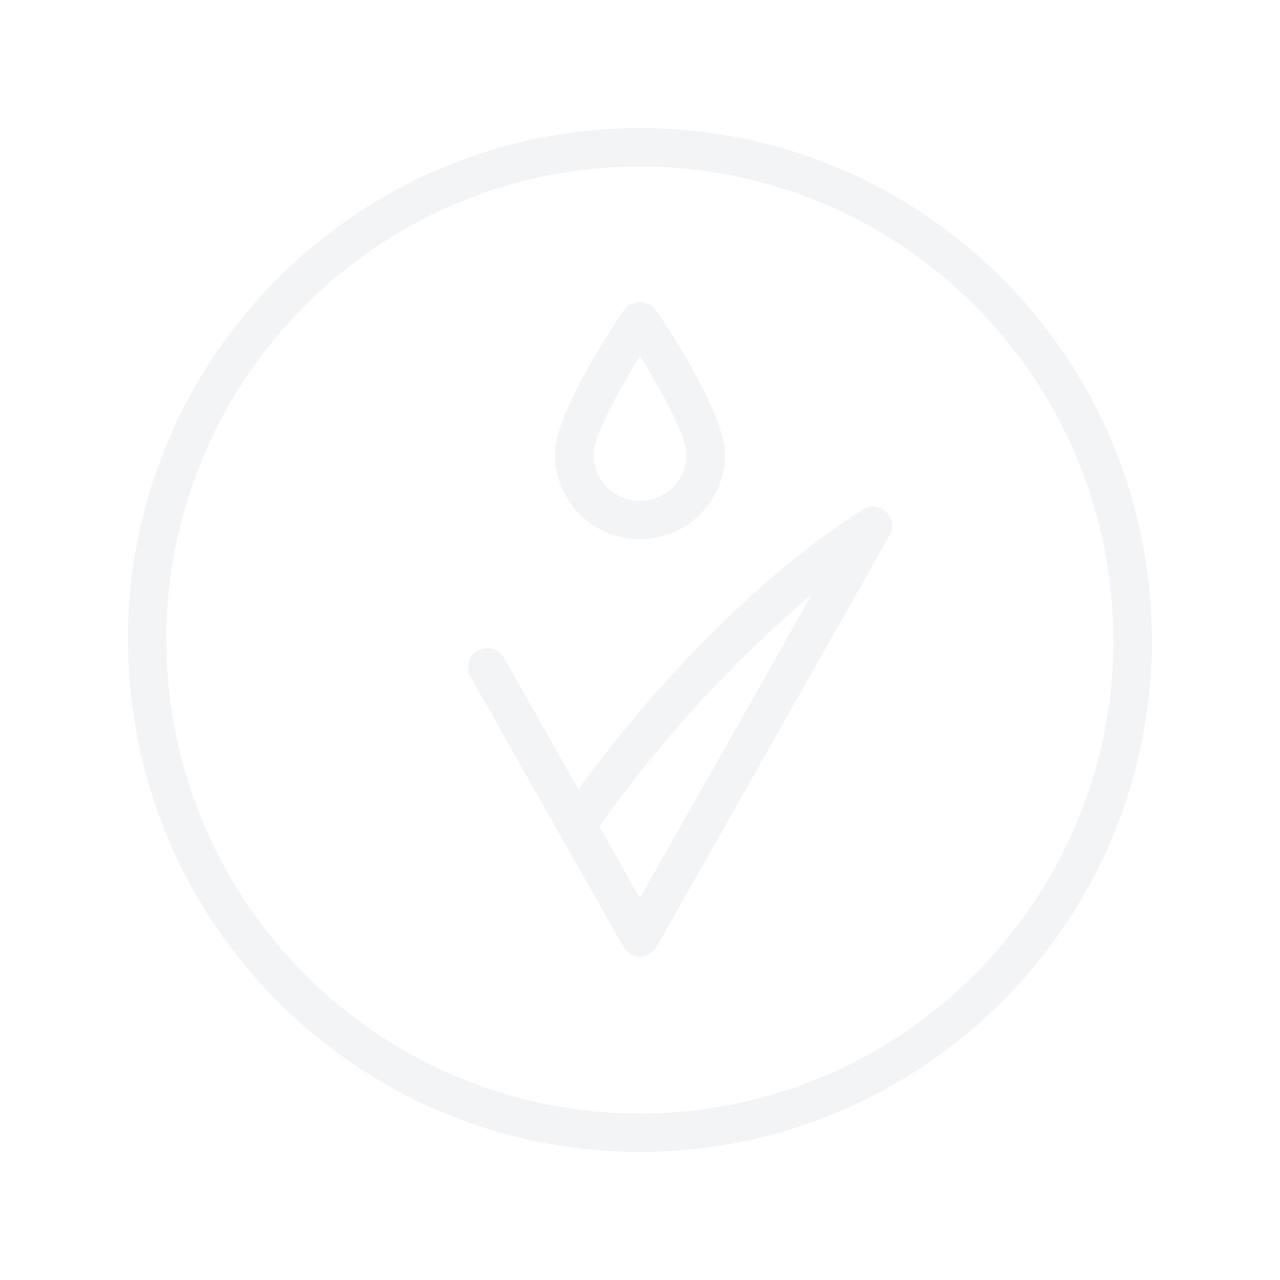 EYLURE Naturals Lashes No.031